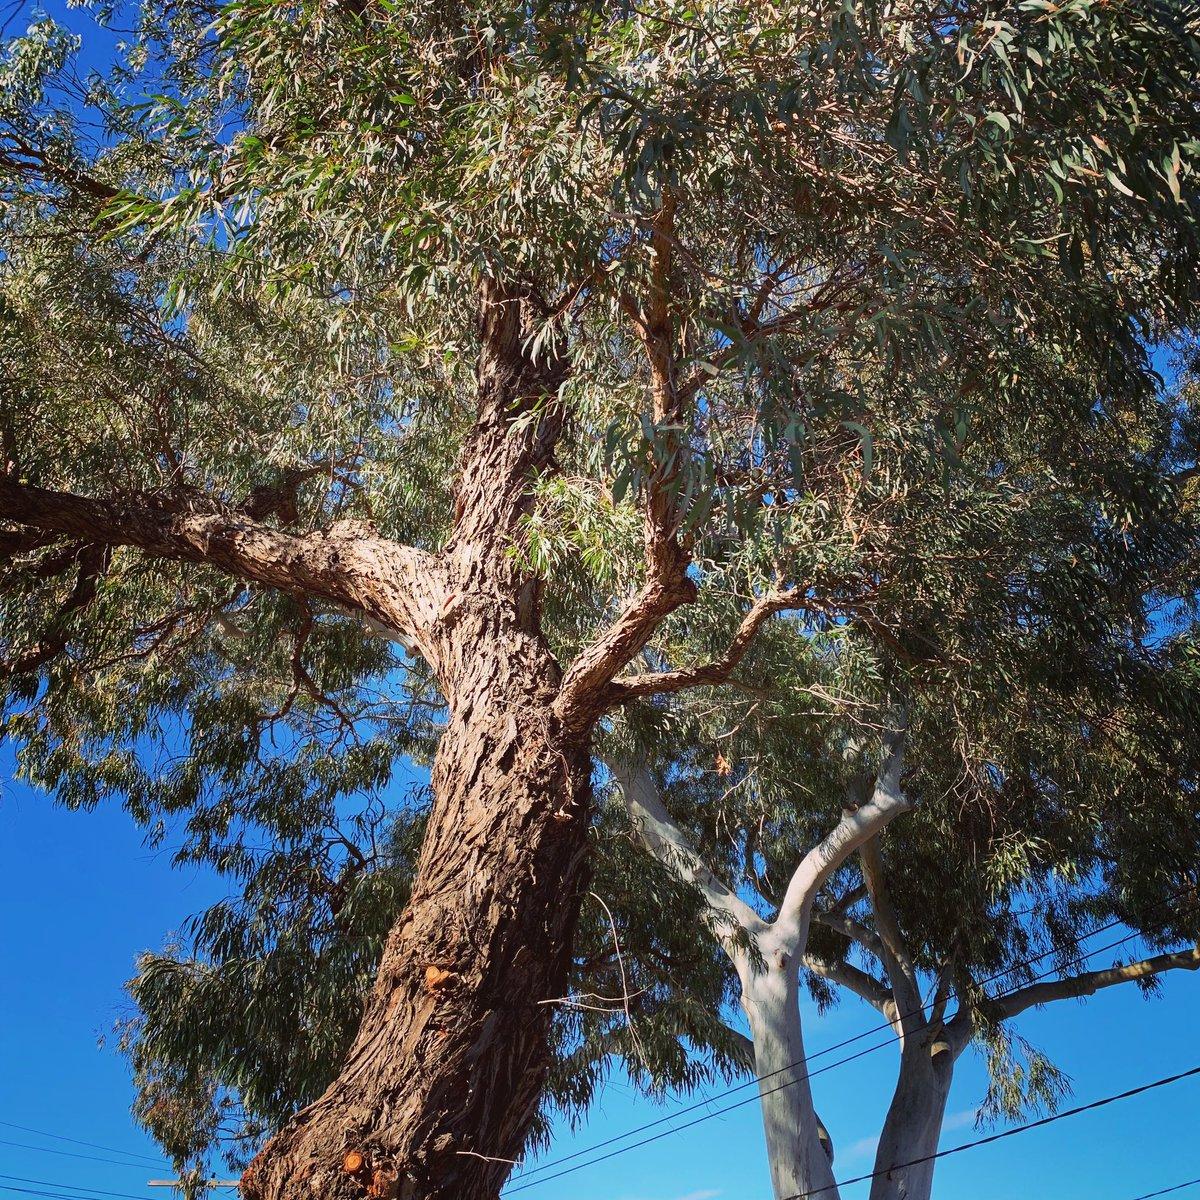 Trees Of Sydney On Twitter Eucalyptus Nicholii Narrow Leaved Black Peppermint Eucalyptus Scoparia Wallangarra White Gum Eucalyptusnicholii Narrowleavedblackpeppermint Eucalyptusscoparia Wallangarrawhitegum Eucalyptus Gumtrees